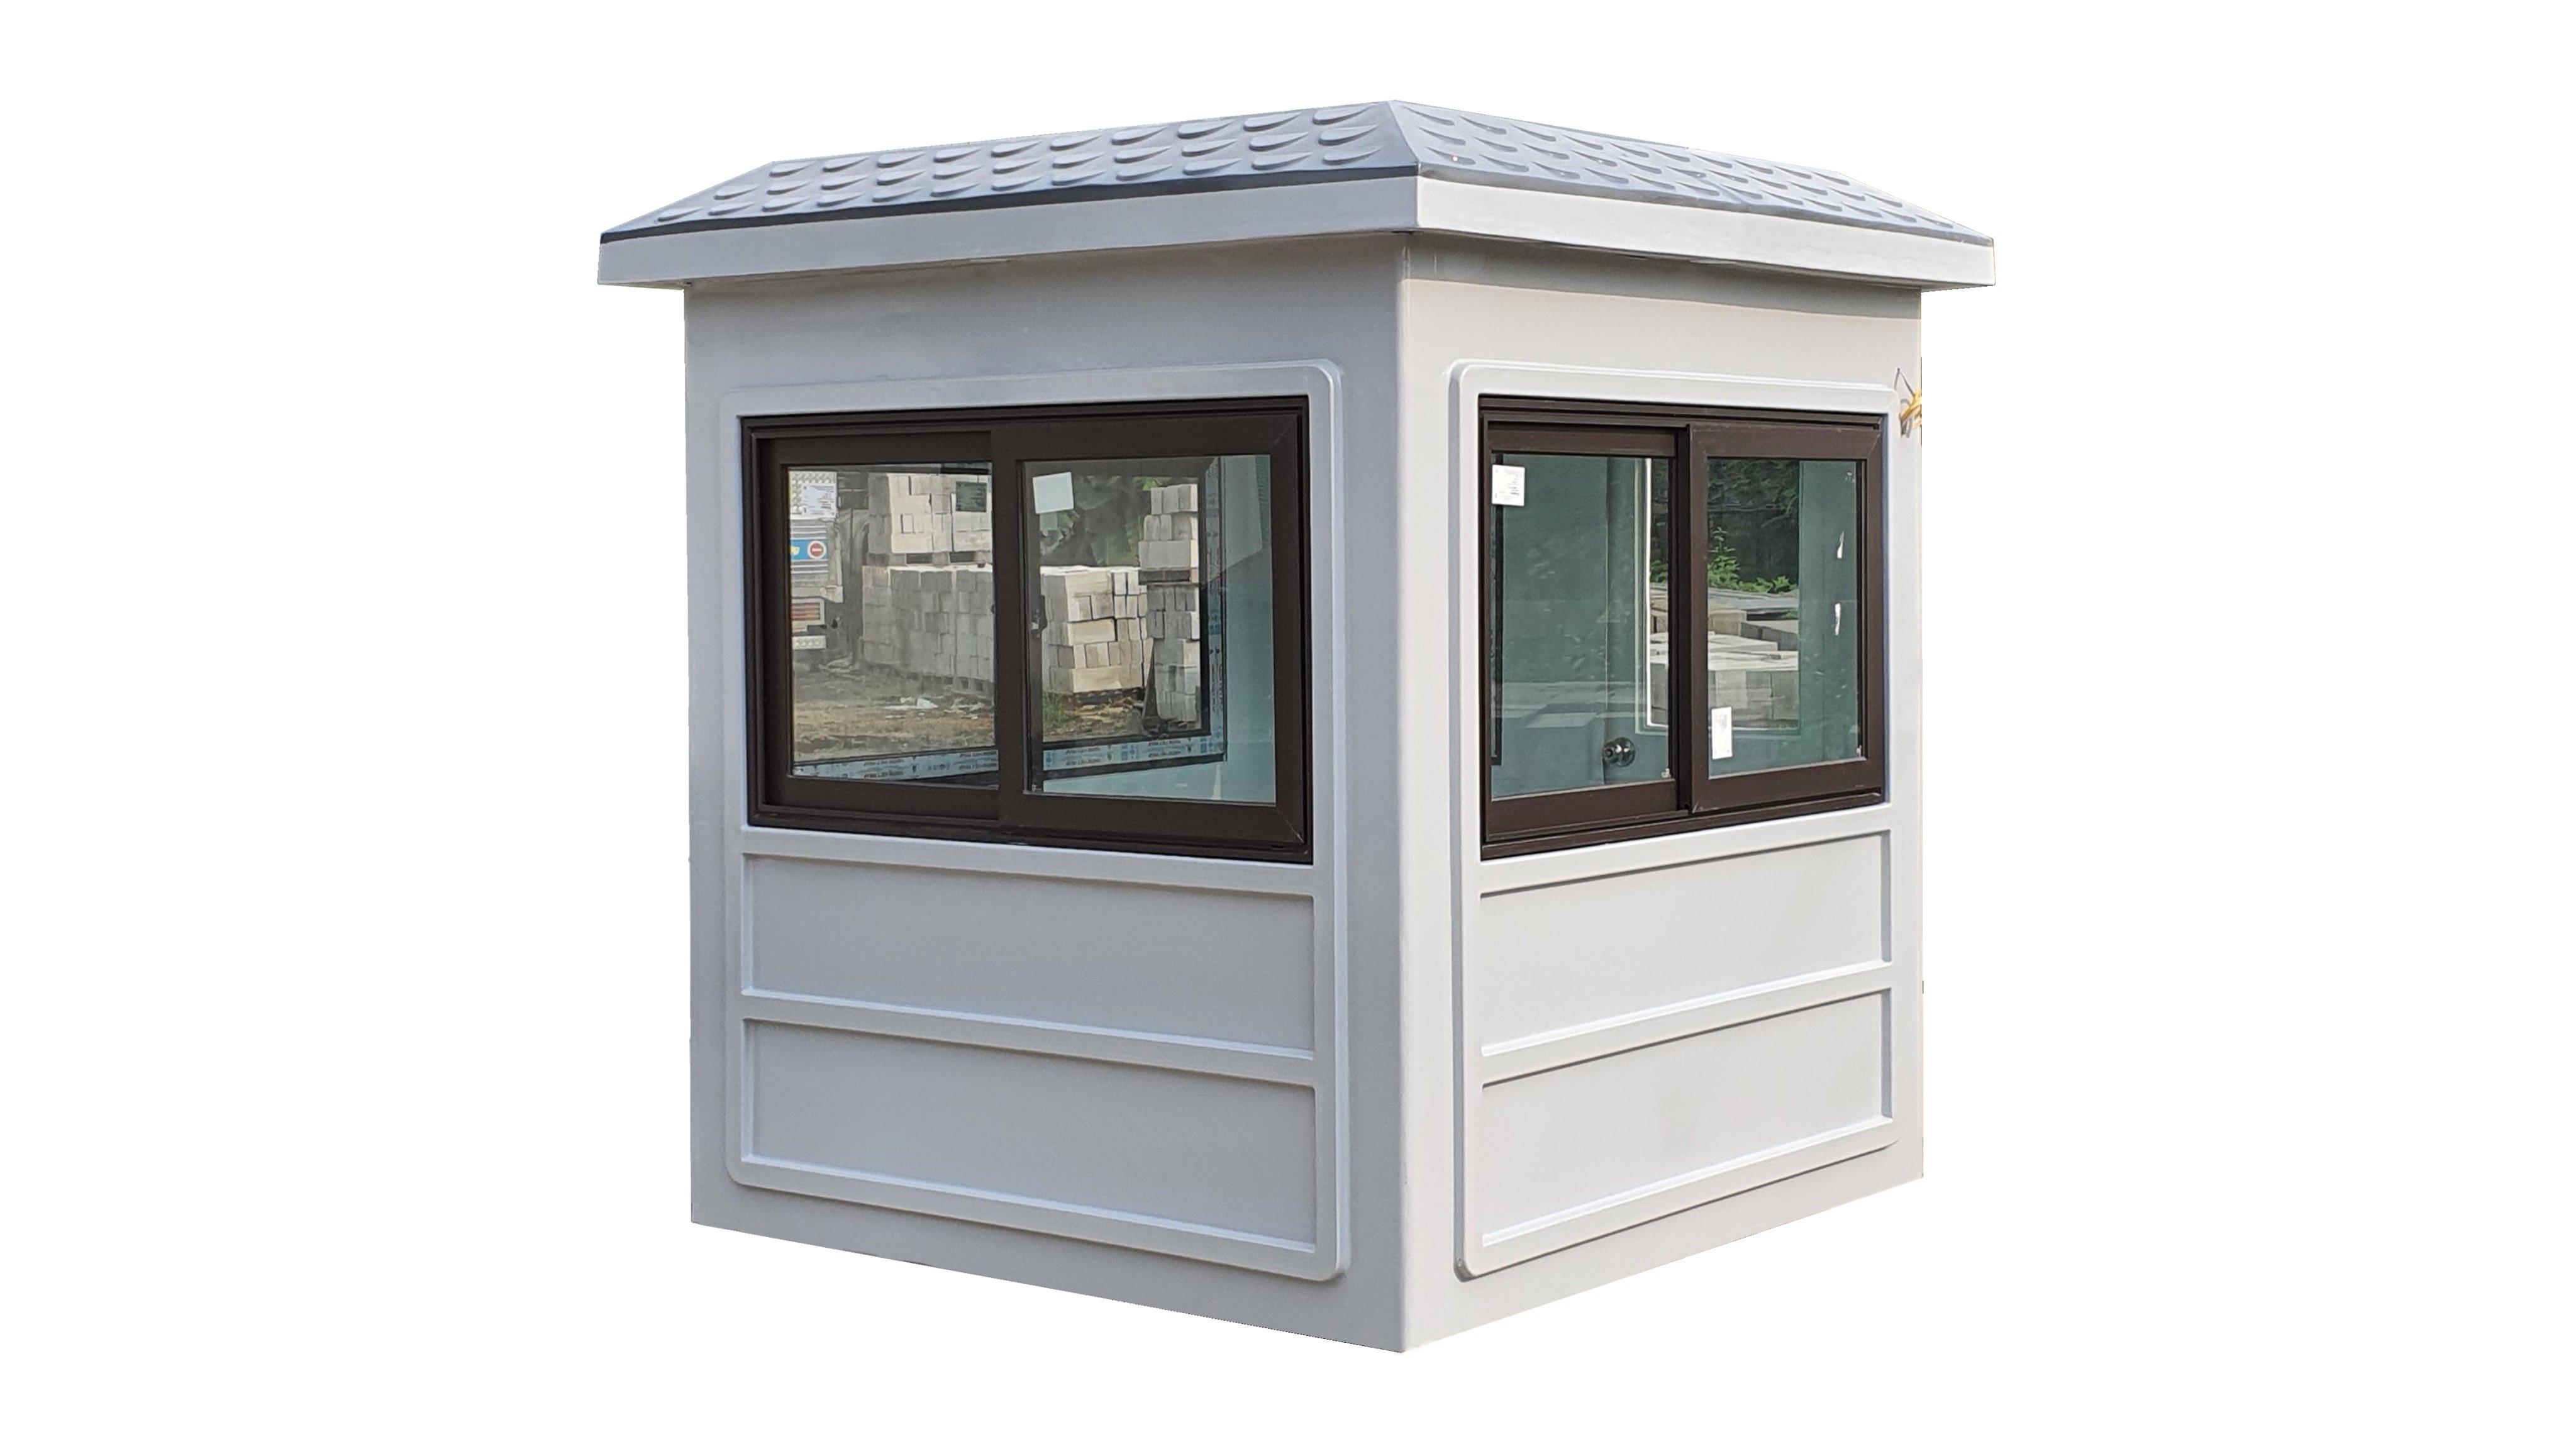 Cabin bảo vệ composite Handy Booth